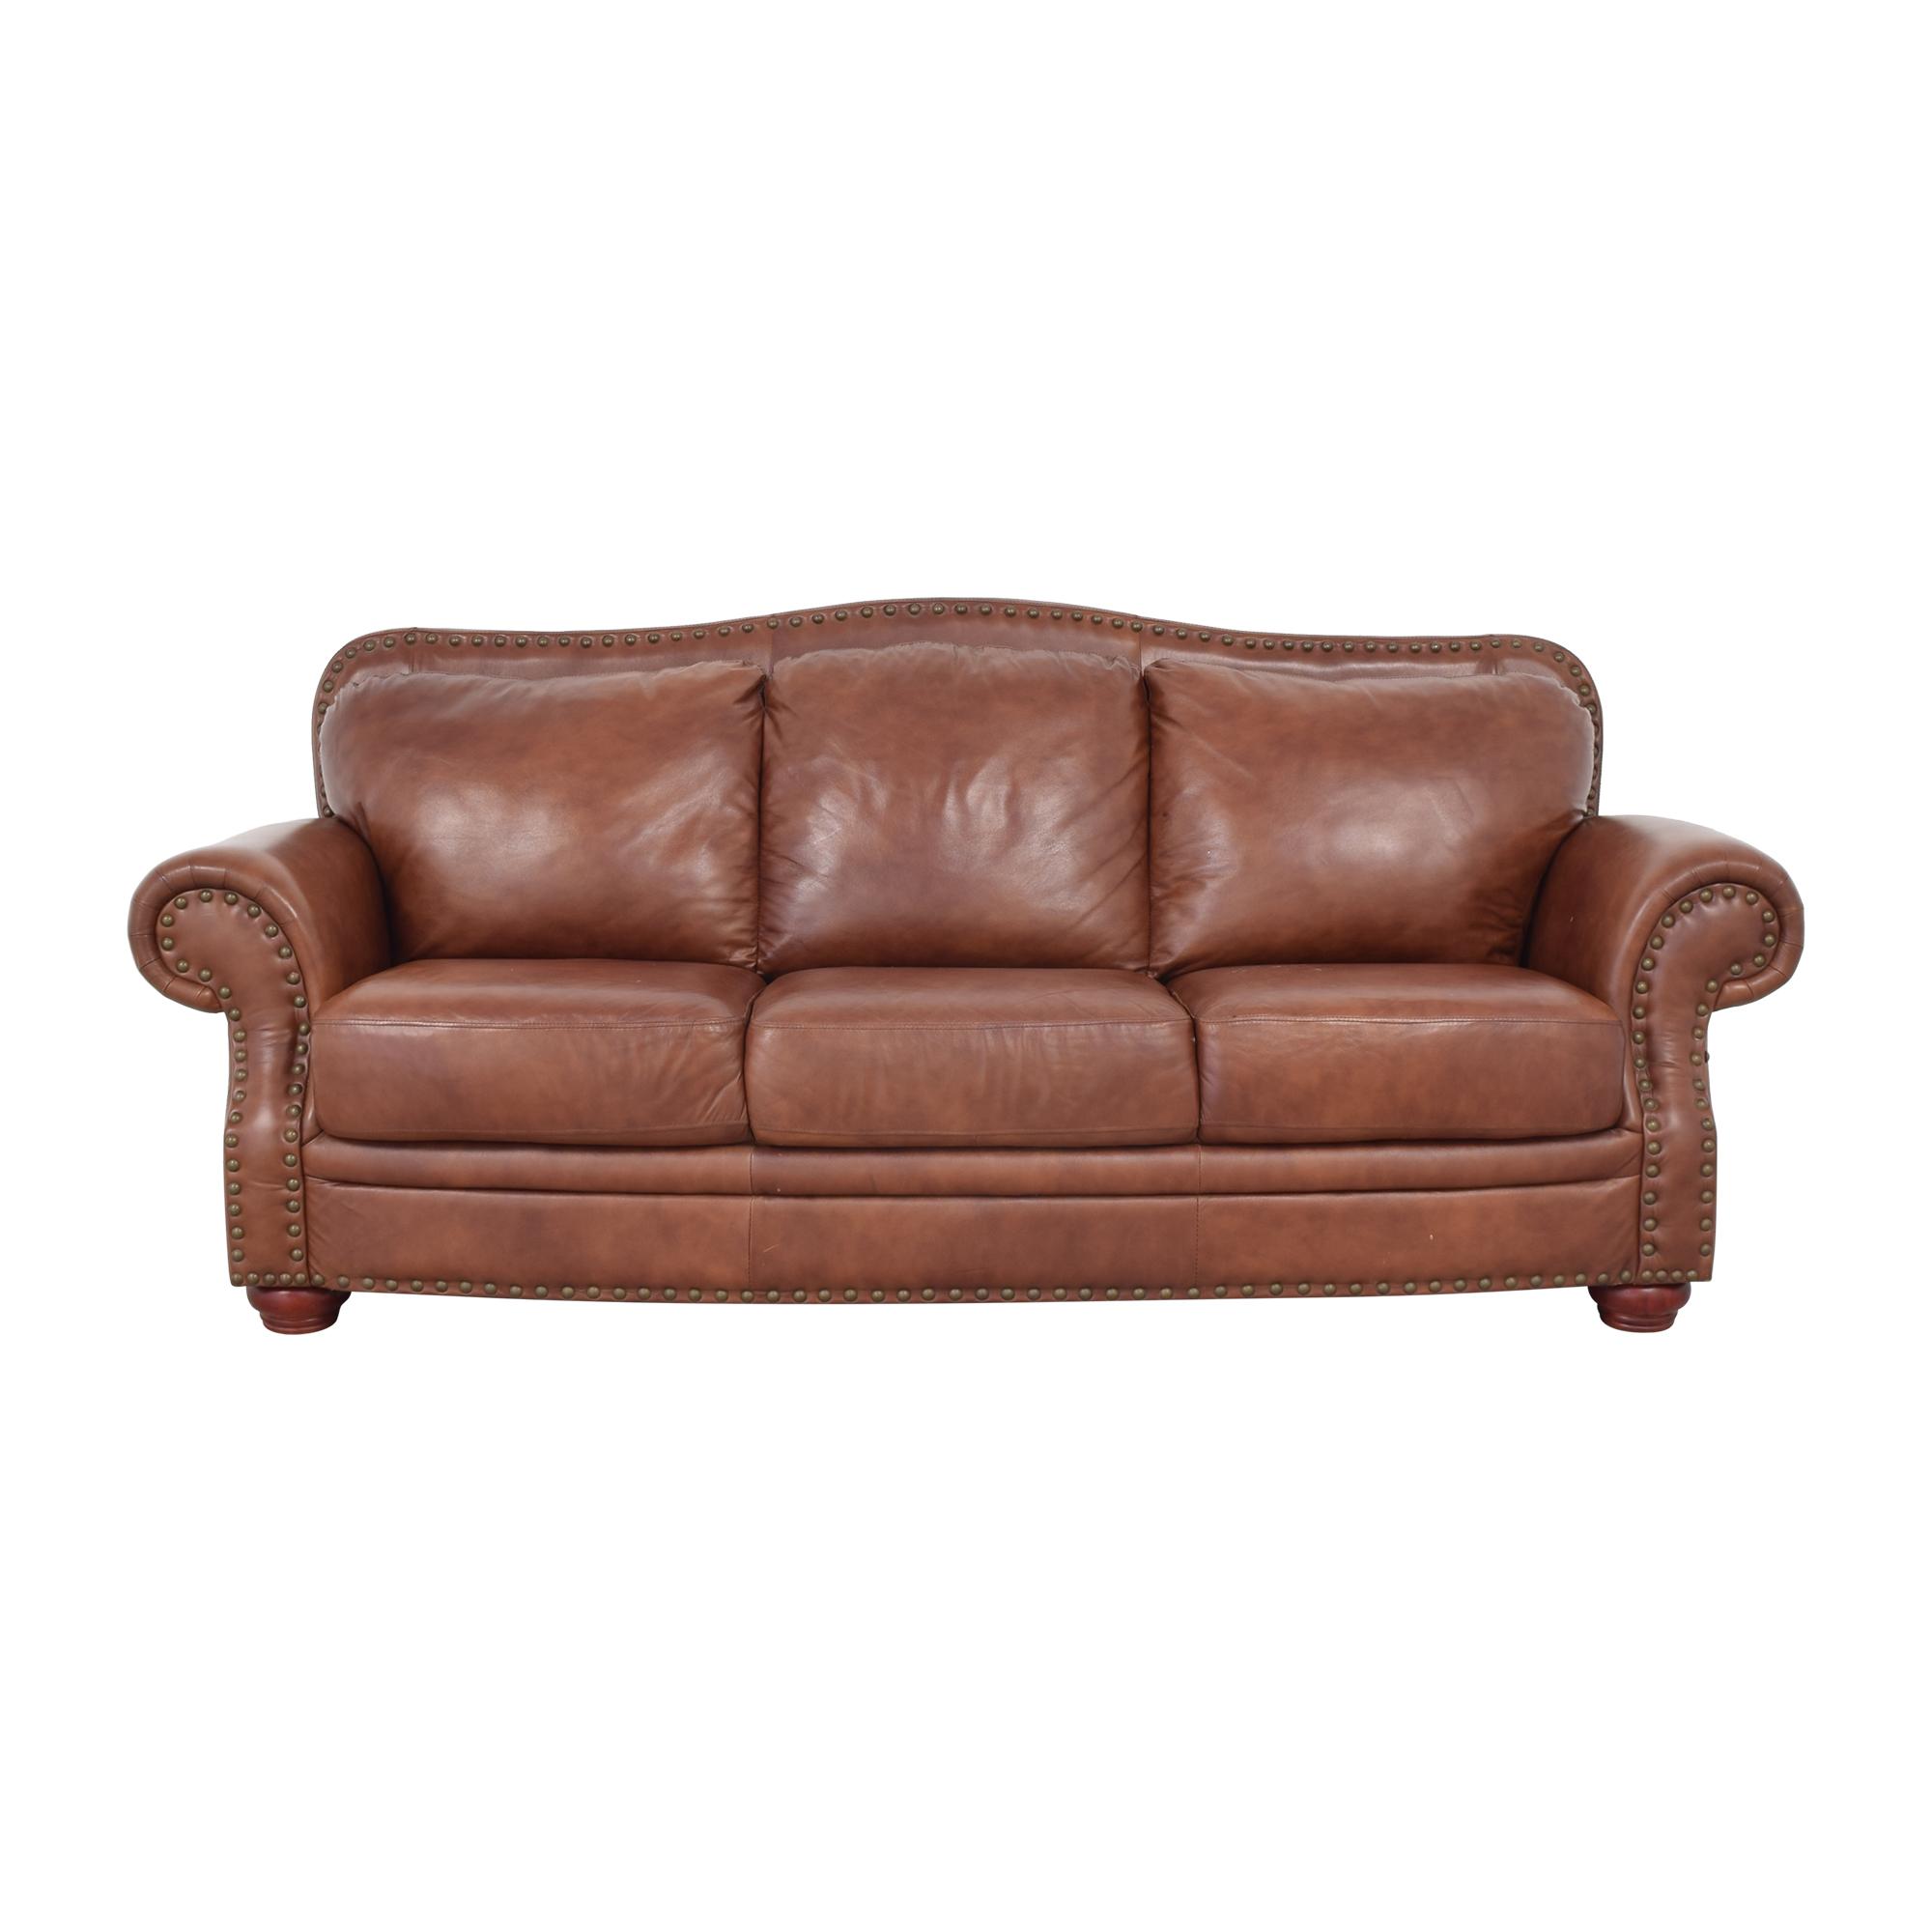 Rolled Arm Camel Back Sofa